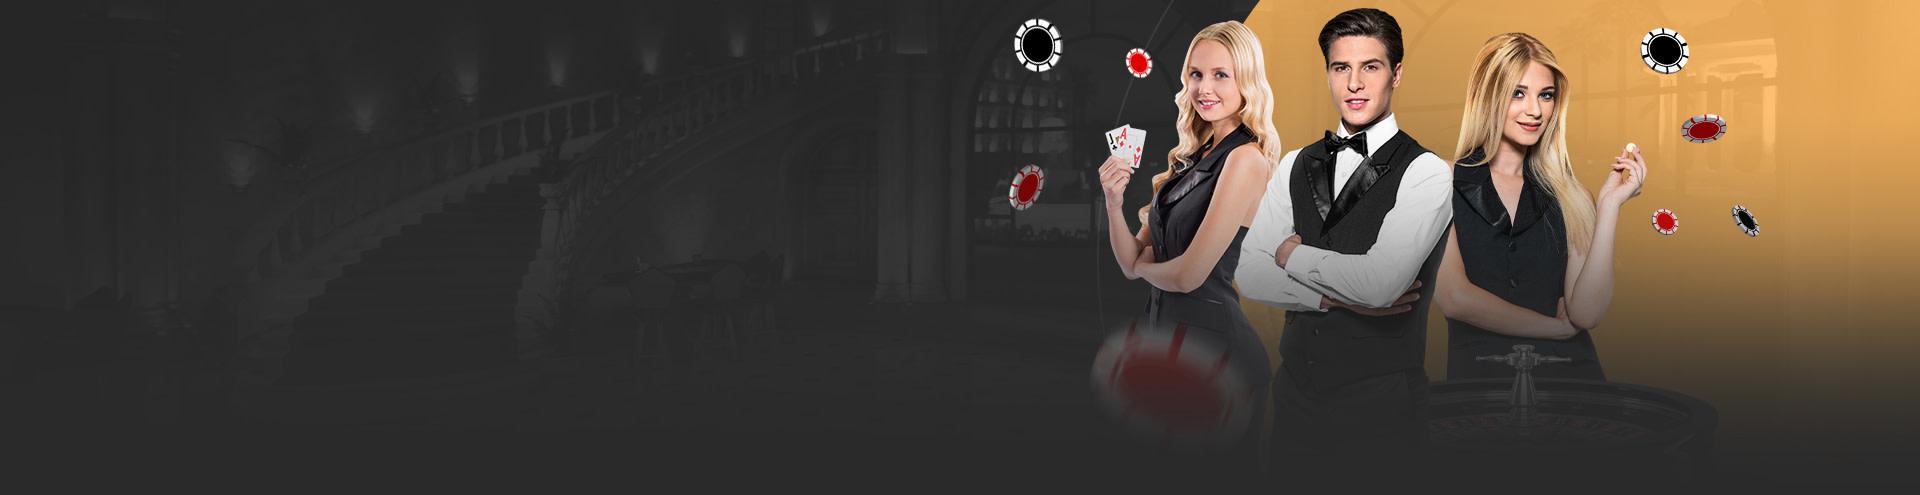 Arcanebet-Live-Casino-Promo